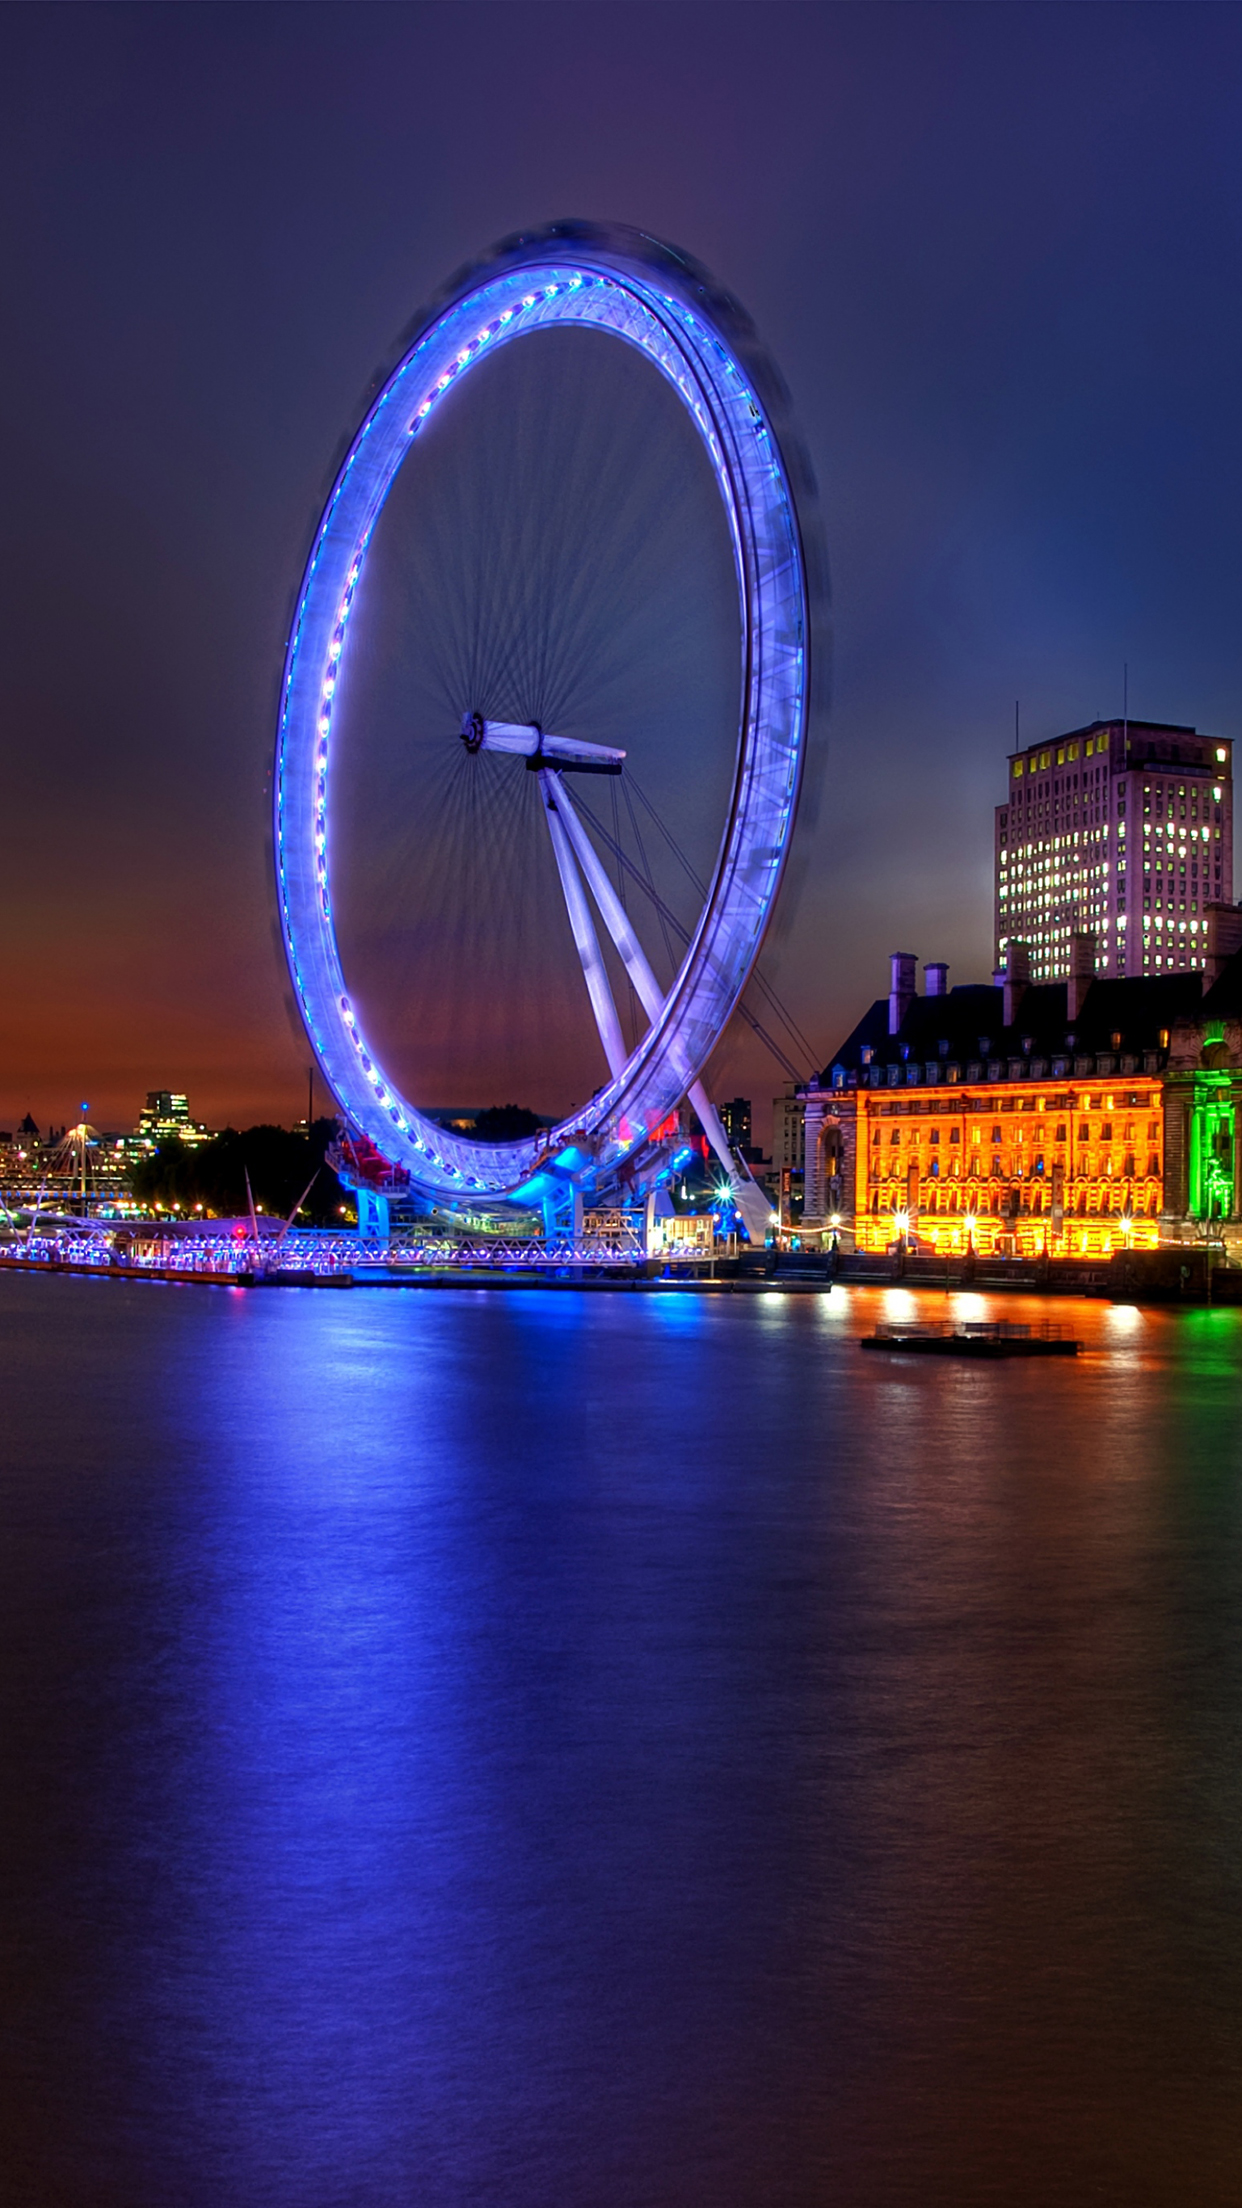 Londres Wheel 3Wallpapers iPhone Parallax Londres : Wheel